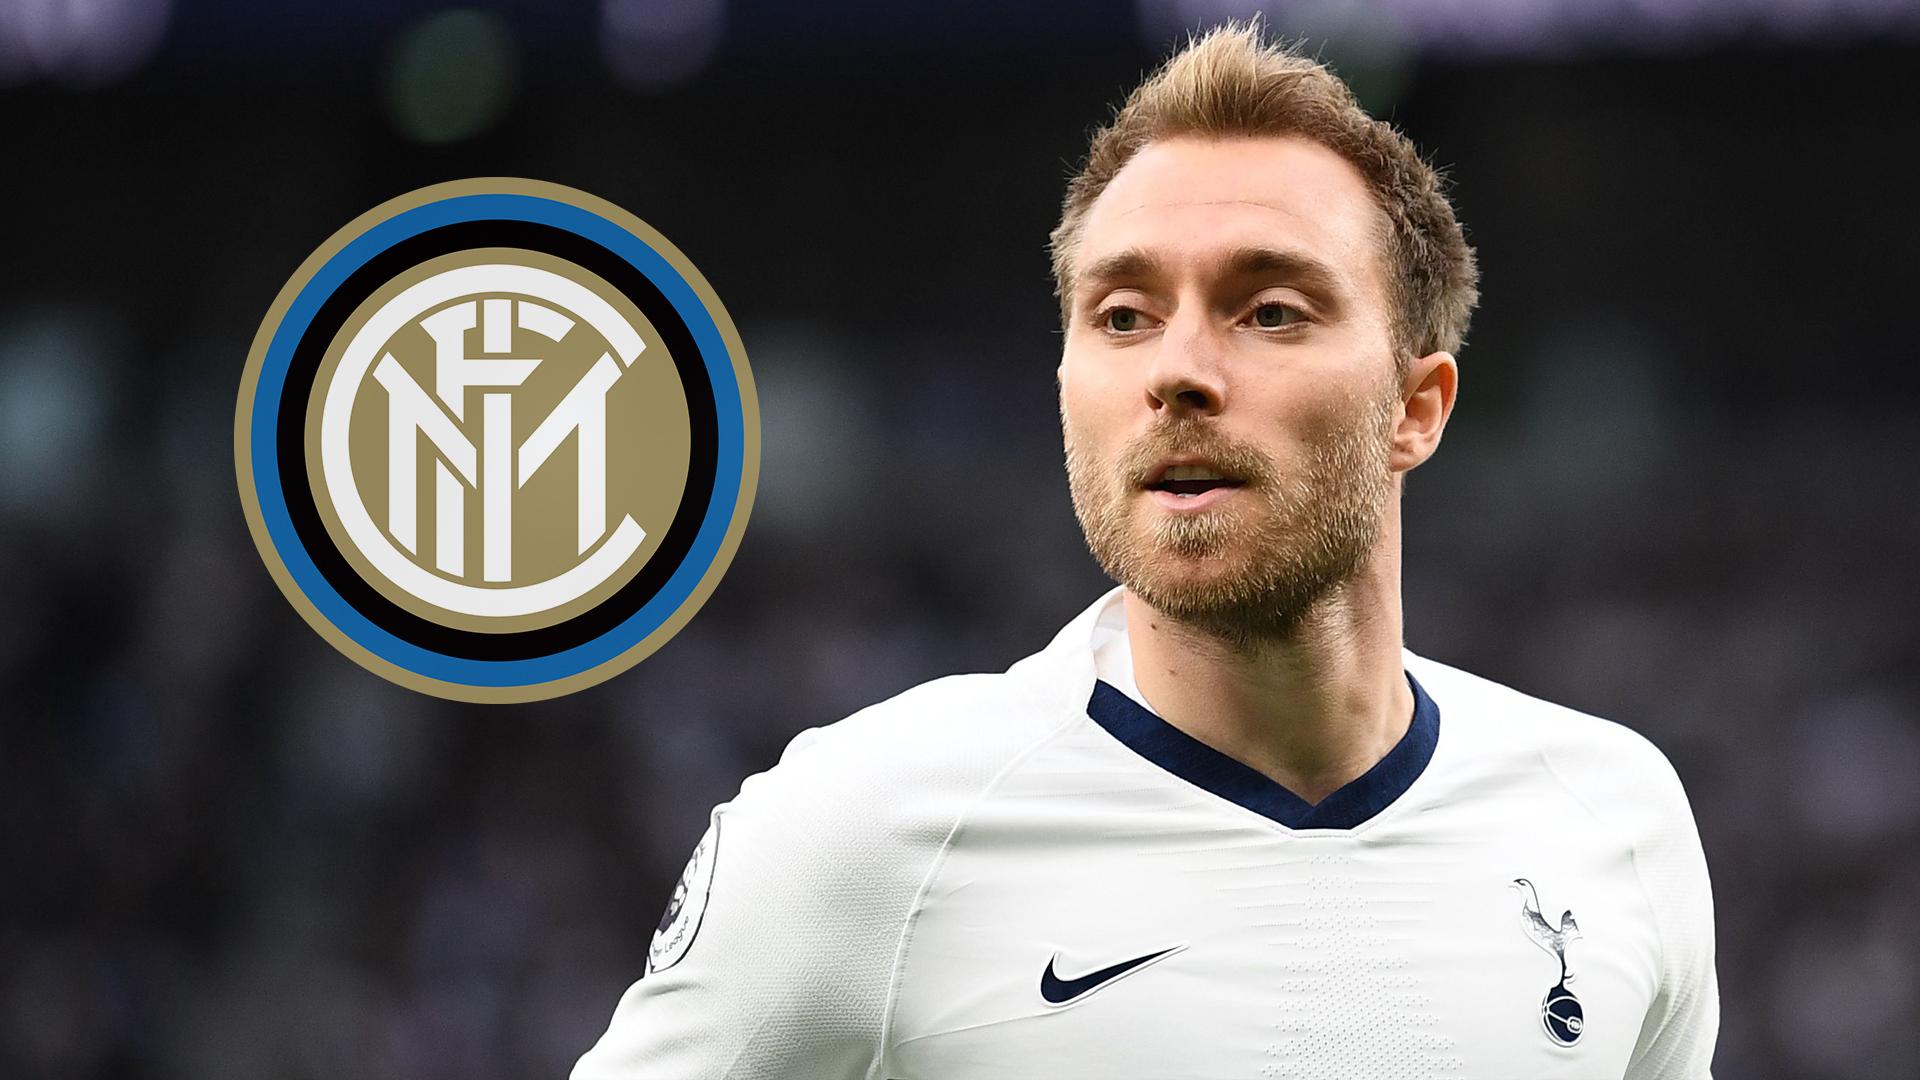 Mercato Inter, sprint per Eriksen: Marotta presenta l'offerta